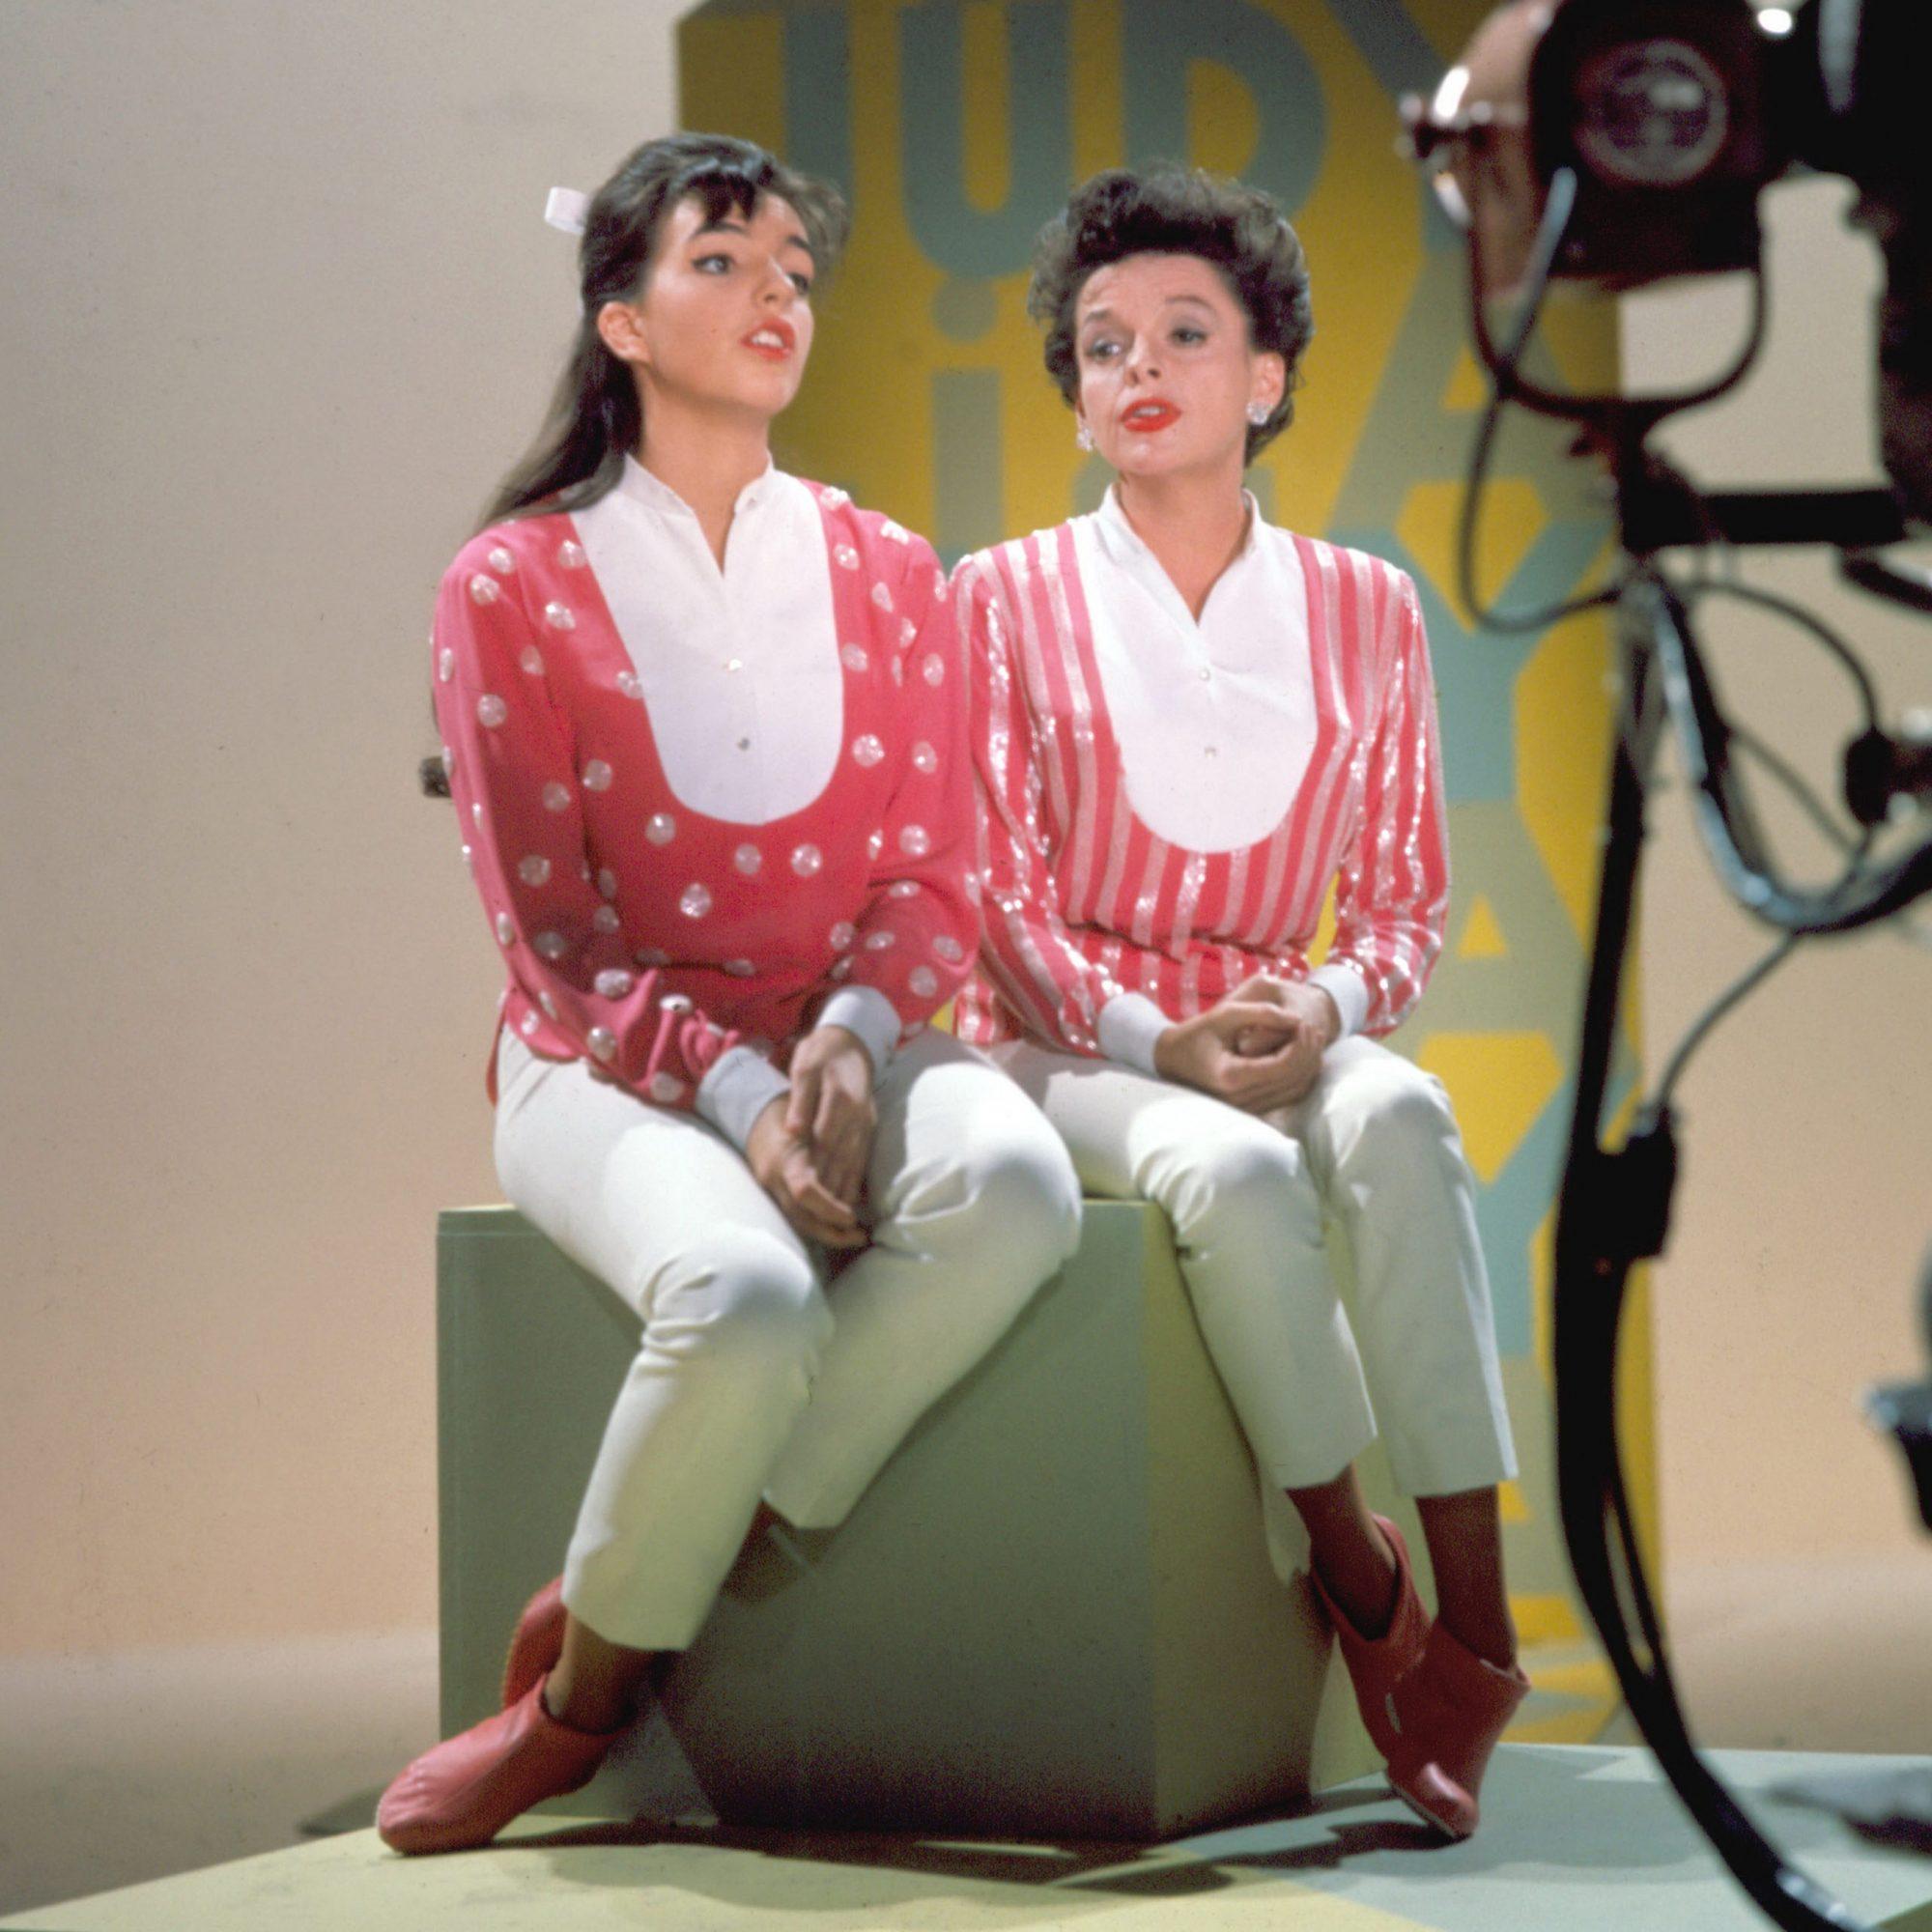 Judy & Liza Perform Together